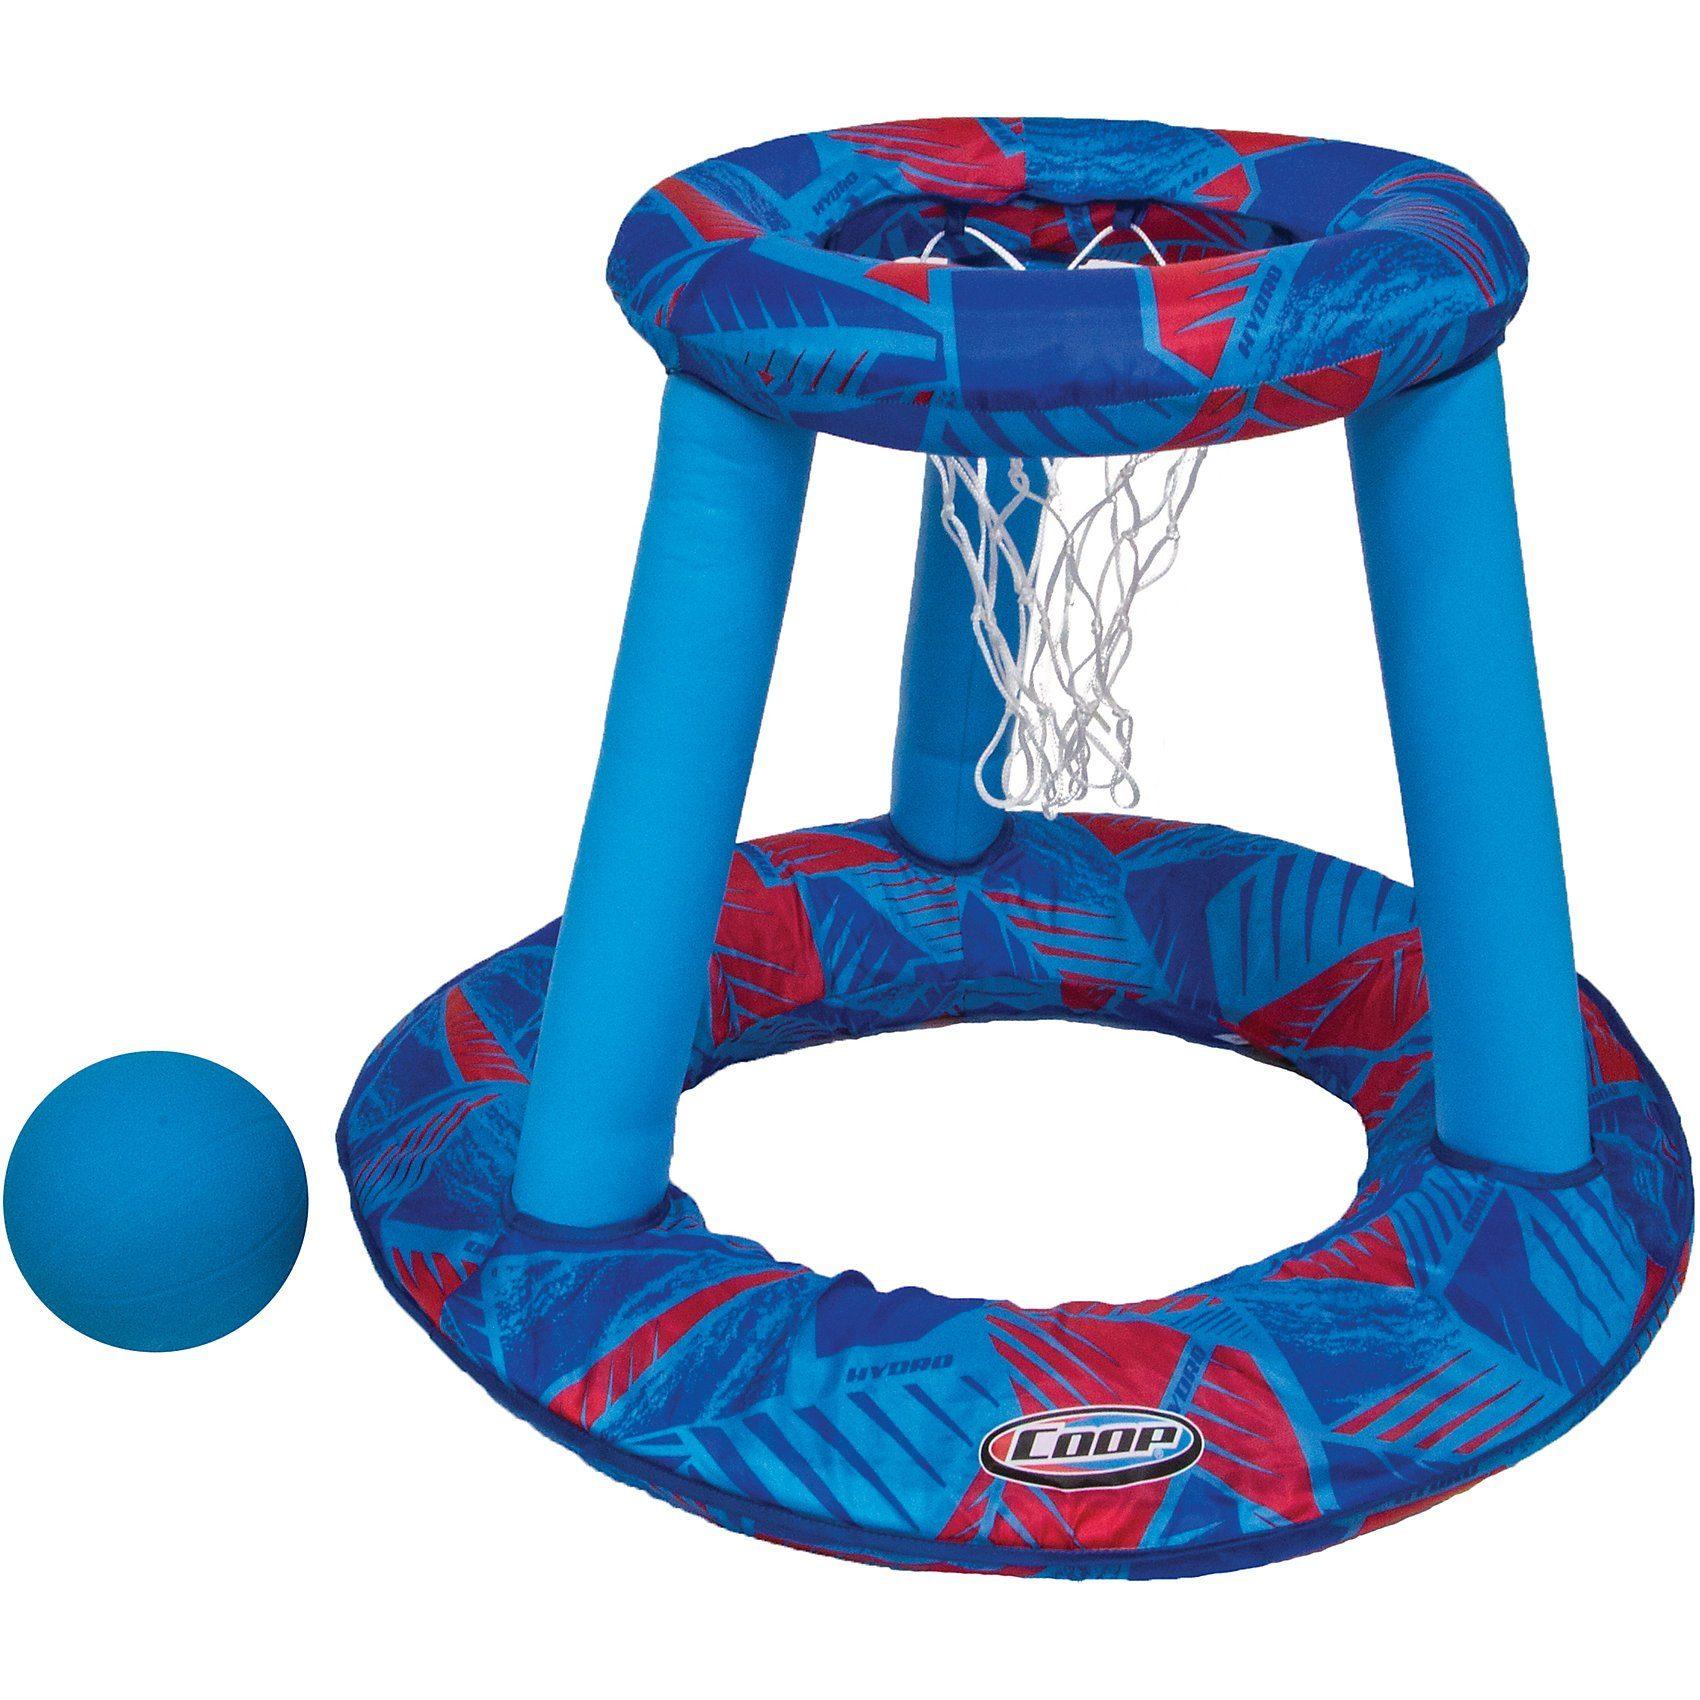 Spin Master Hydro Spring Basketball